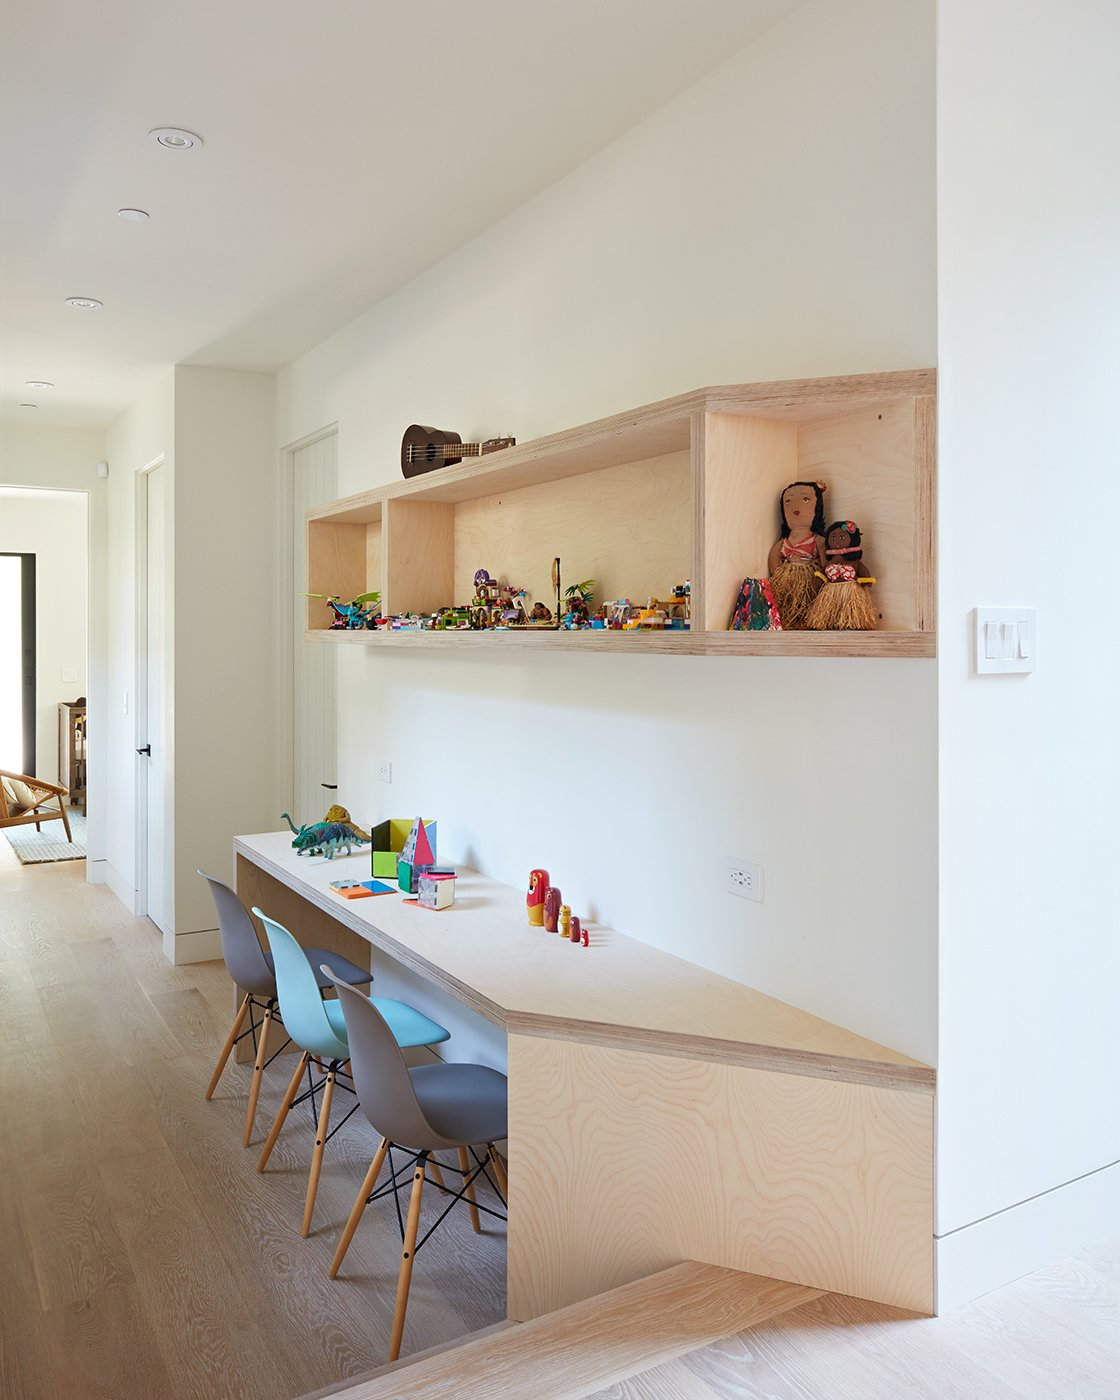 Homeworks Interior Design: Photo 6 Of 9 In Thoughtful Design Details Warm Up A Modern